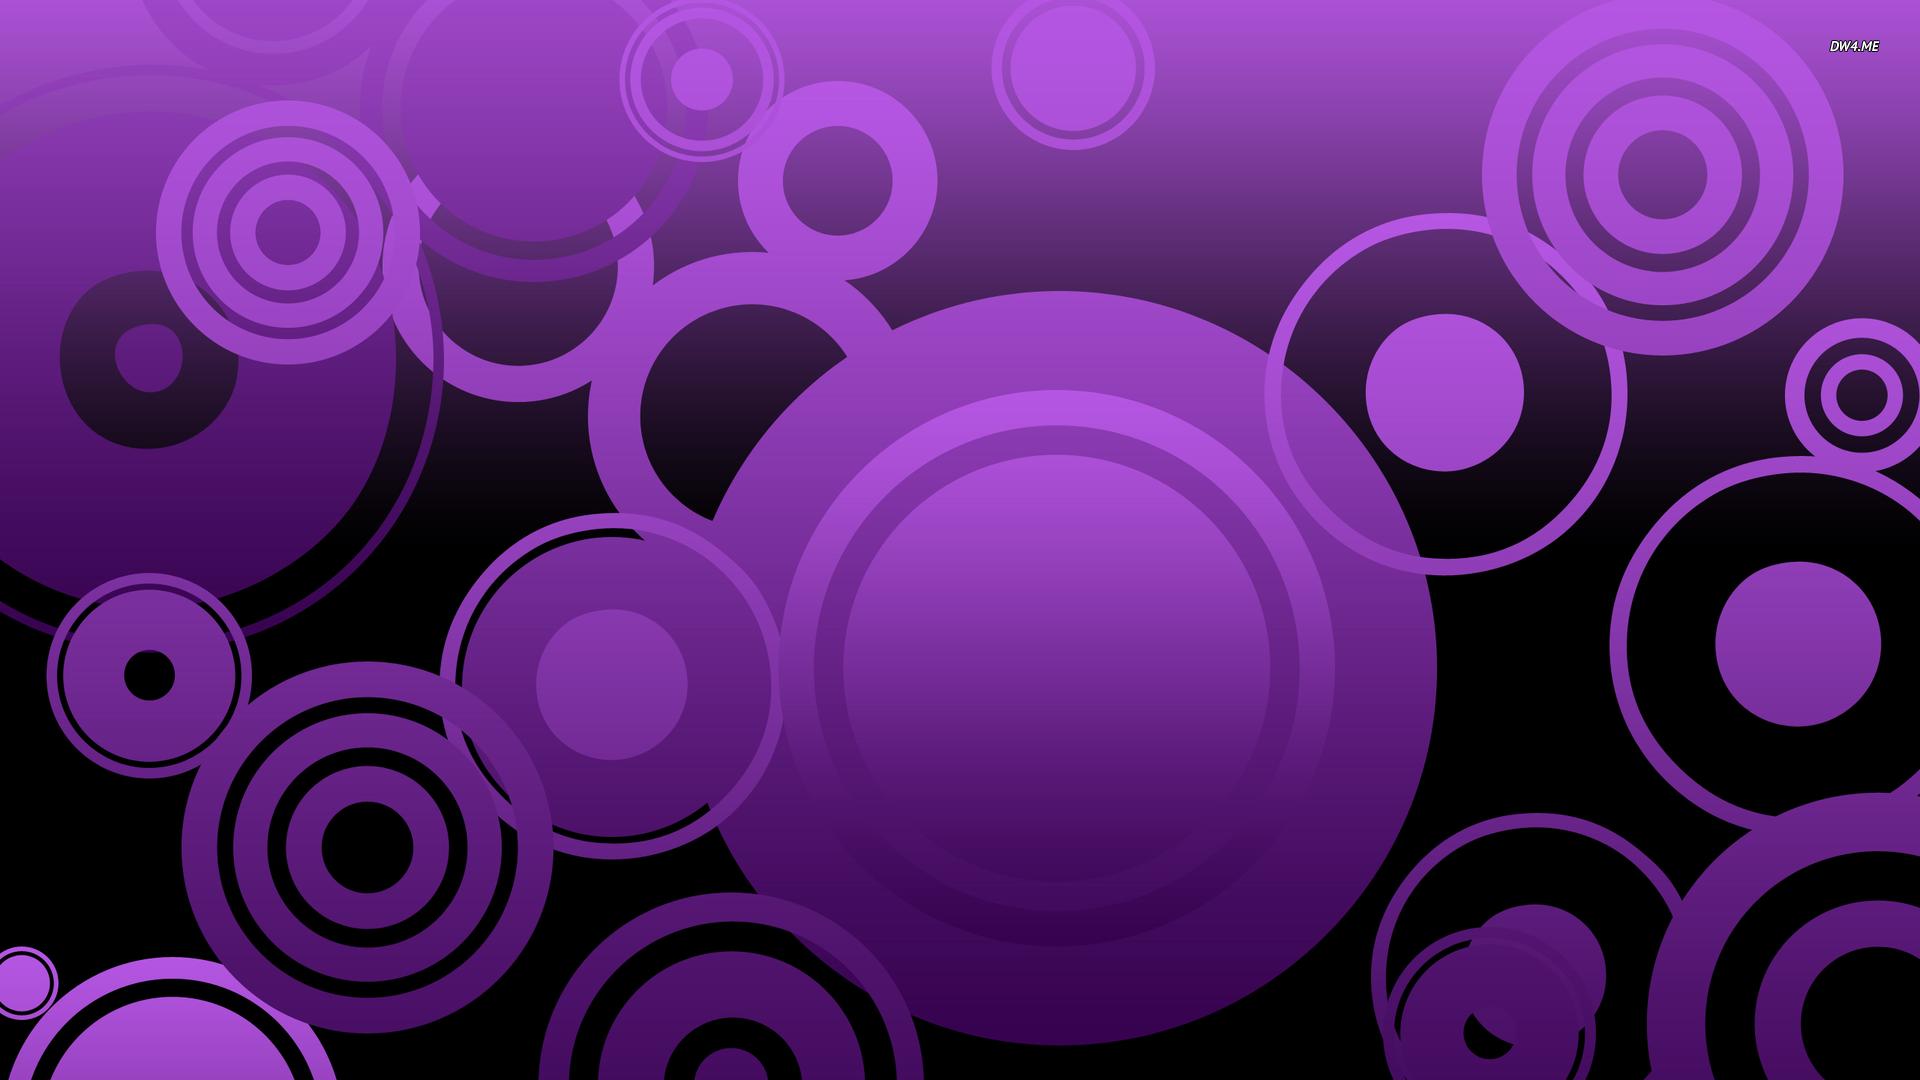 Purple Circles Wallpapers Http Hdwallpapersfcom Purple